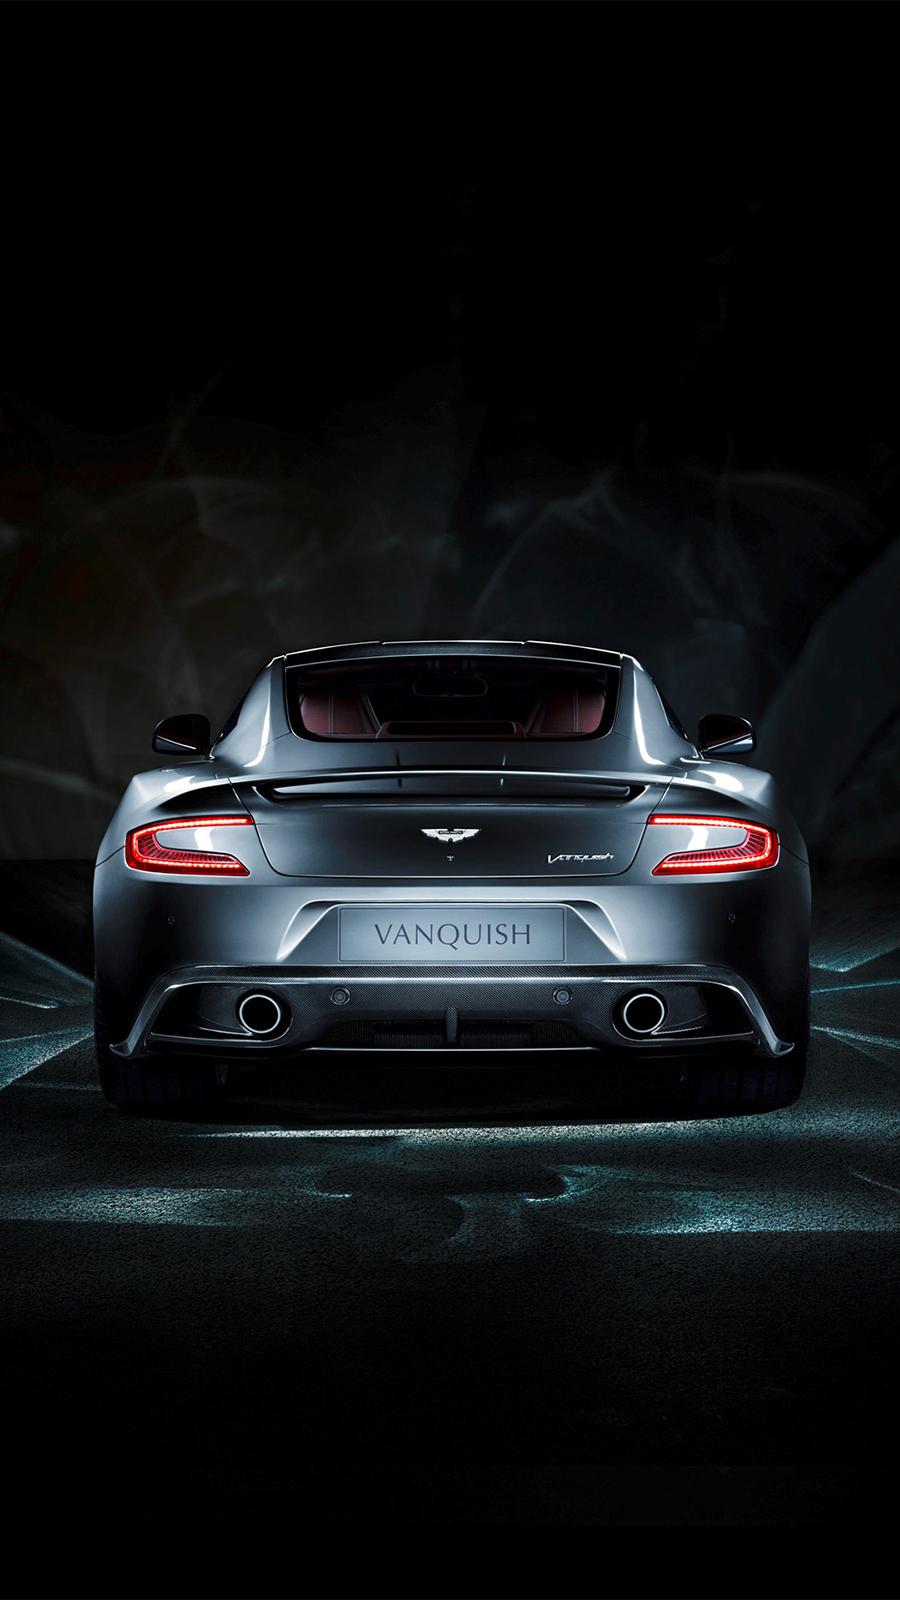 Aston Martin Vanquish Rear Wallpapers